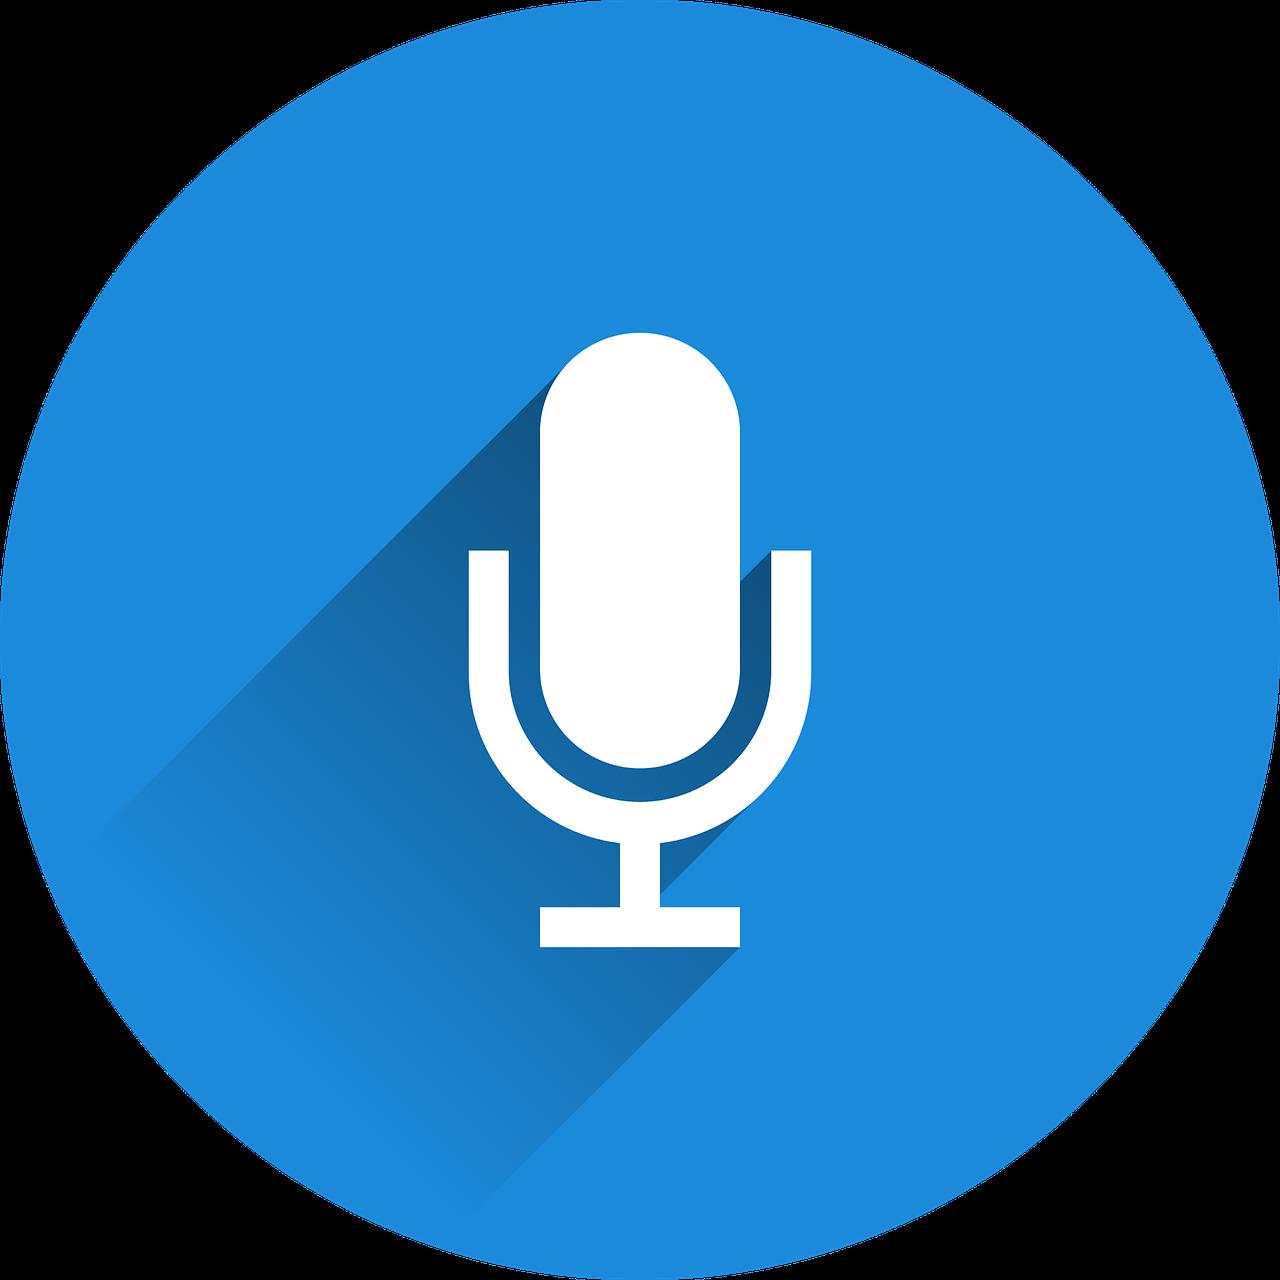 Recherche vocale & seo - agence webmarketing k4tegori